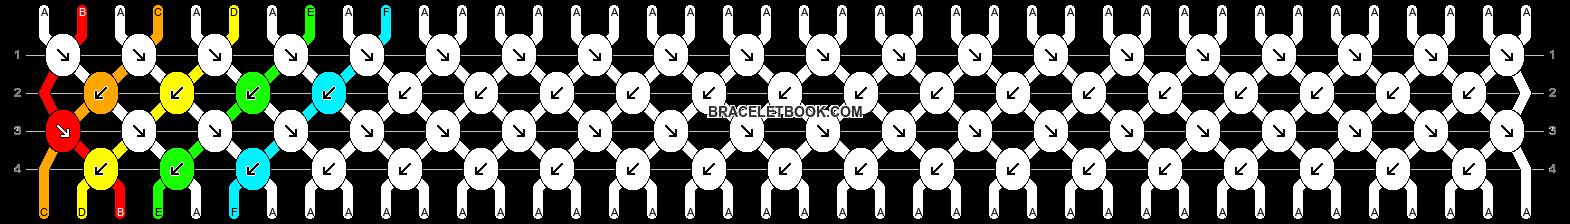 Normal pattern #27764 variation #13104 pattern